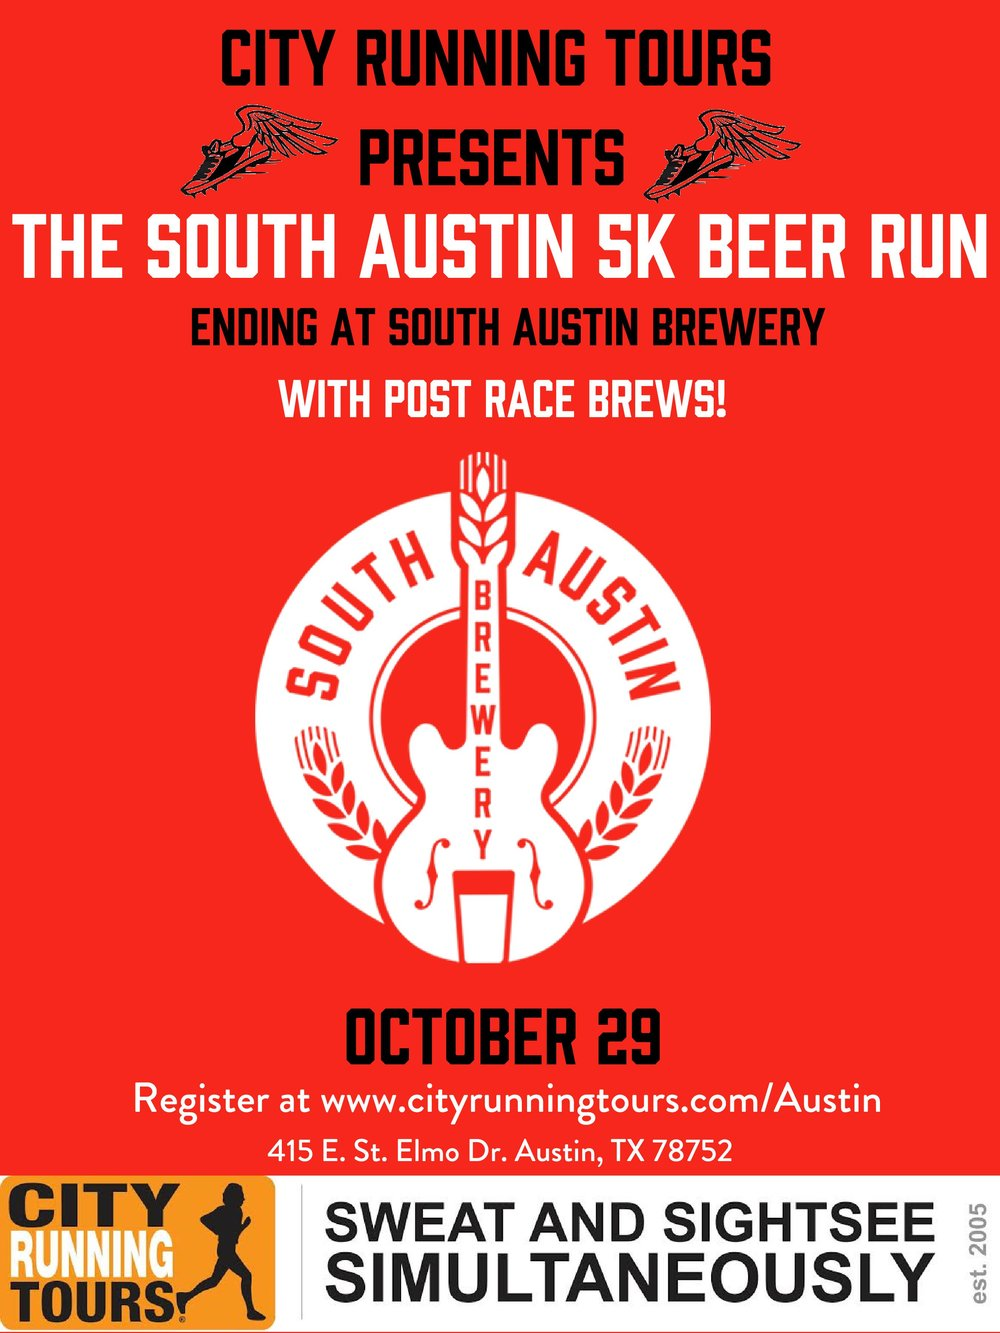 South Austin 5K Beer Run-Oct 29-1-page-001.jpg